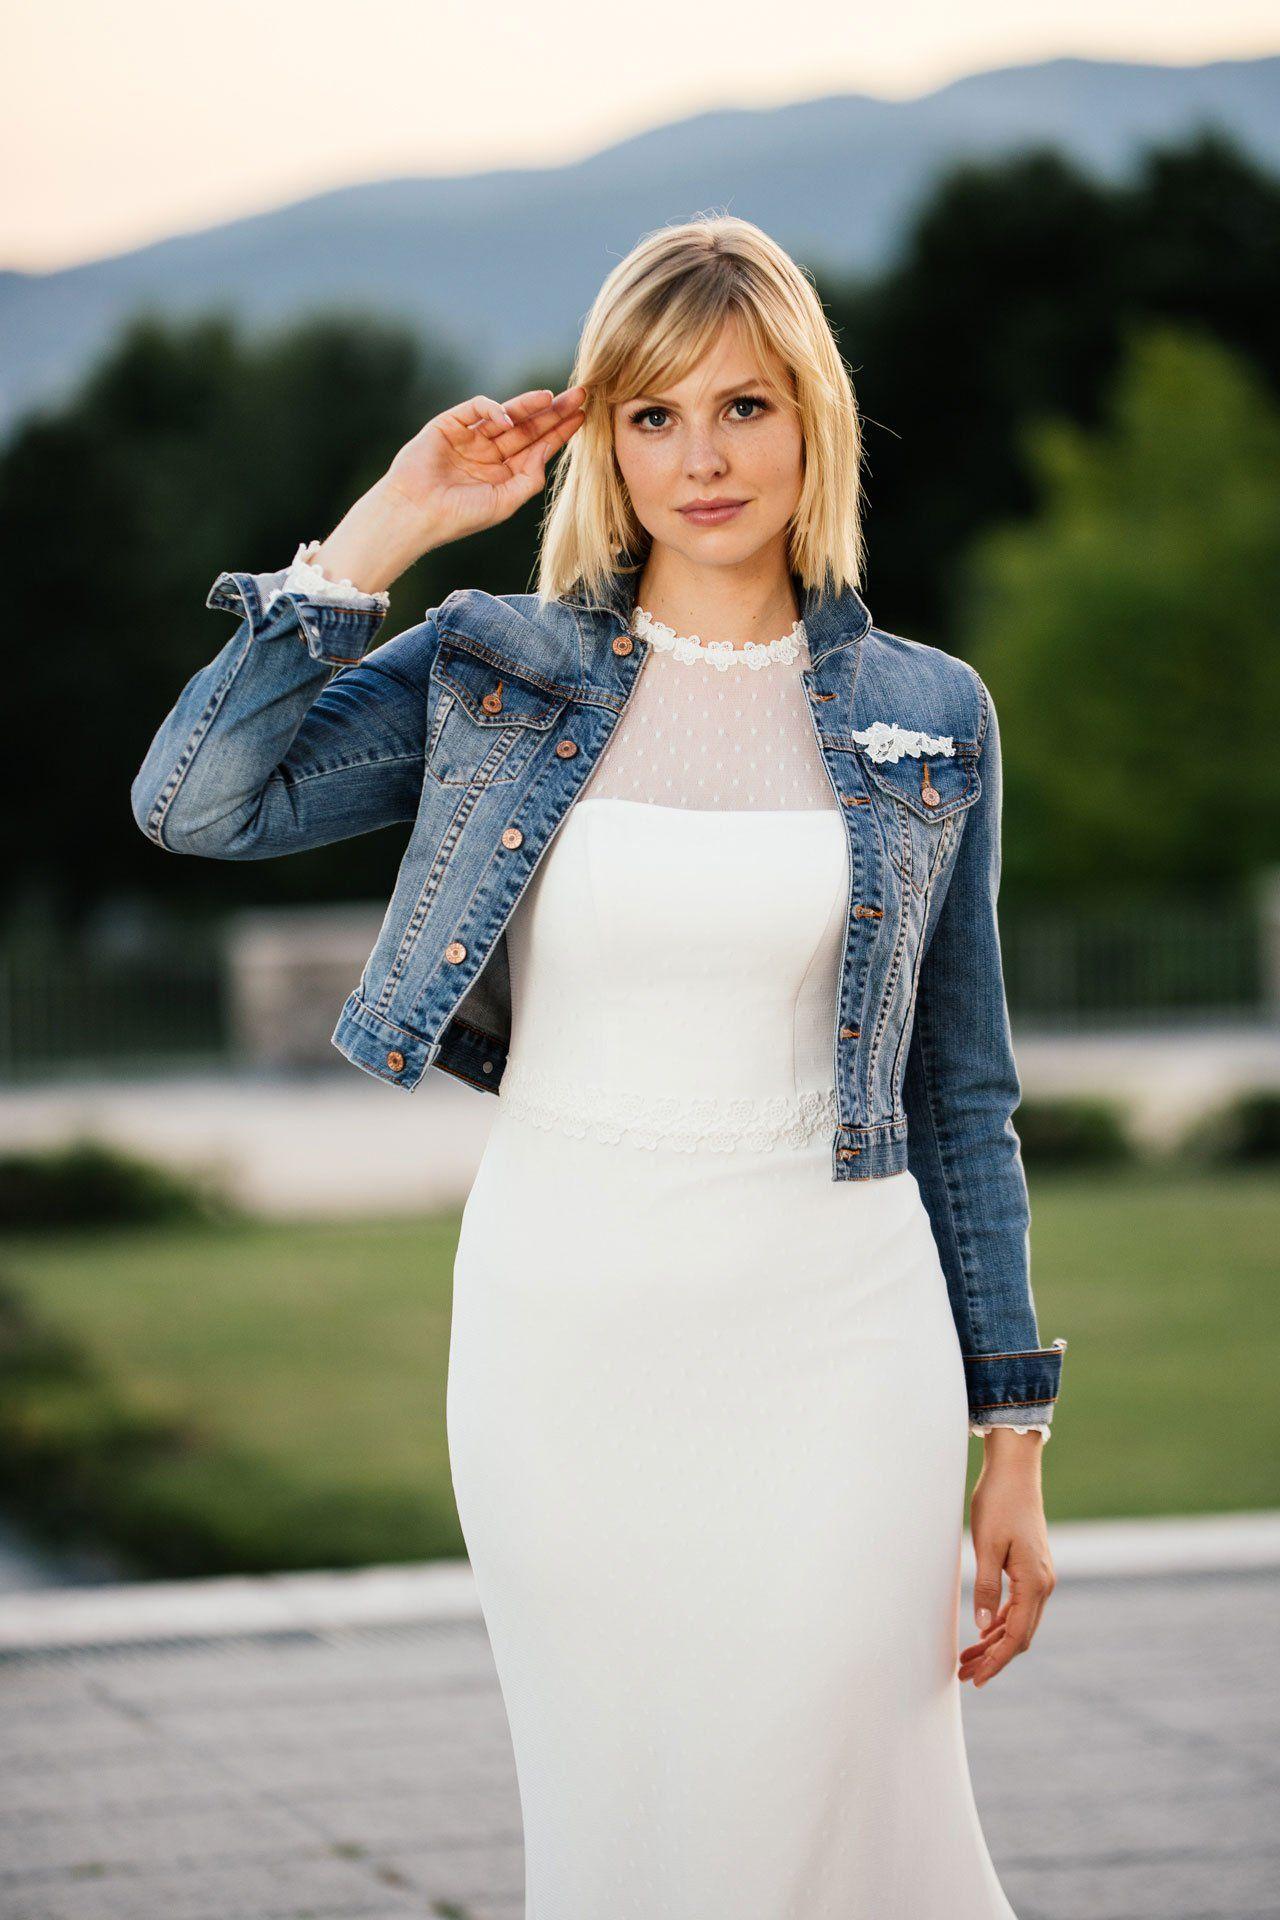 Hochgeschlossenes Brautkleid + knackig coole Jeansjacke = ein echt ...